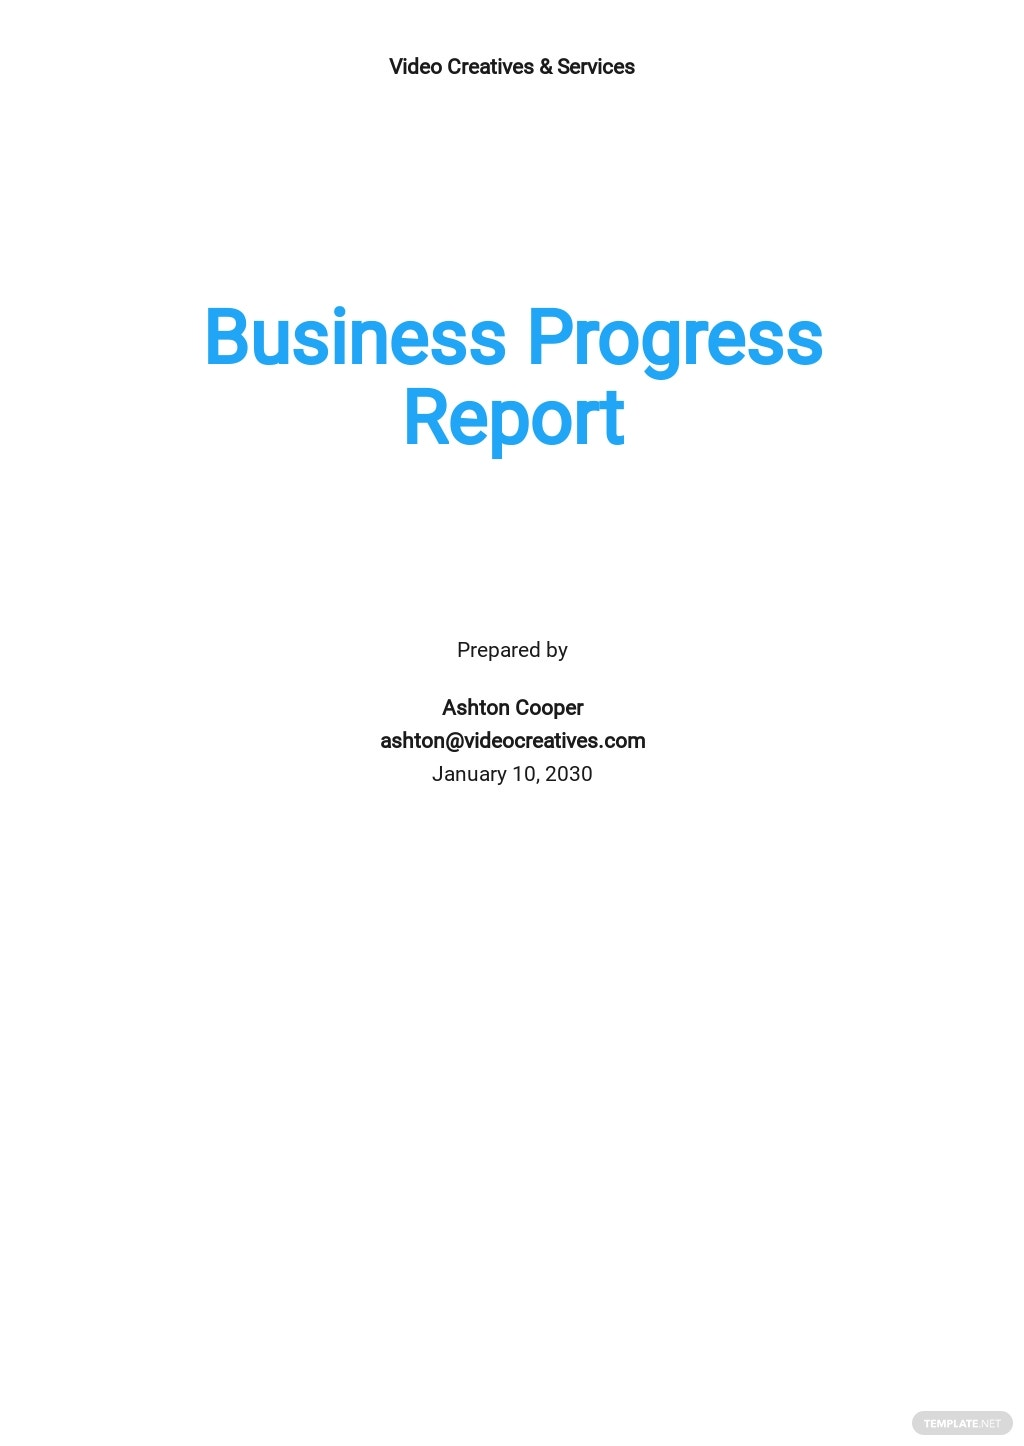 Business Progress Report Template.jpe